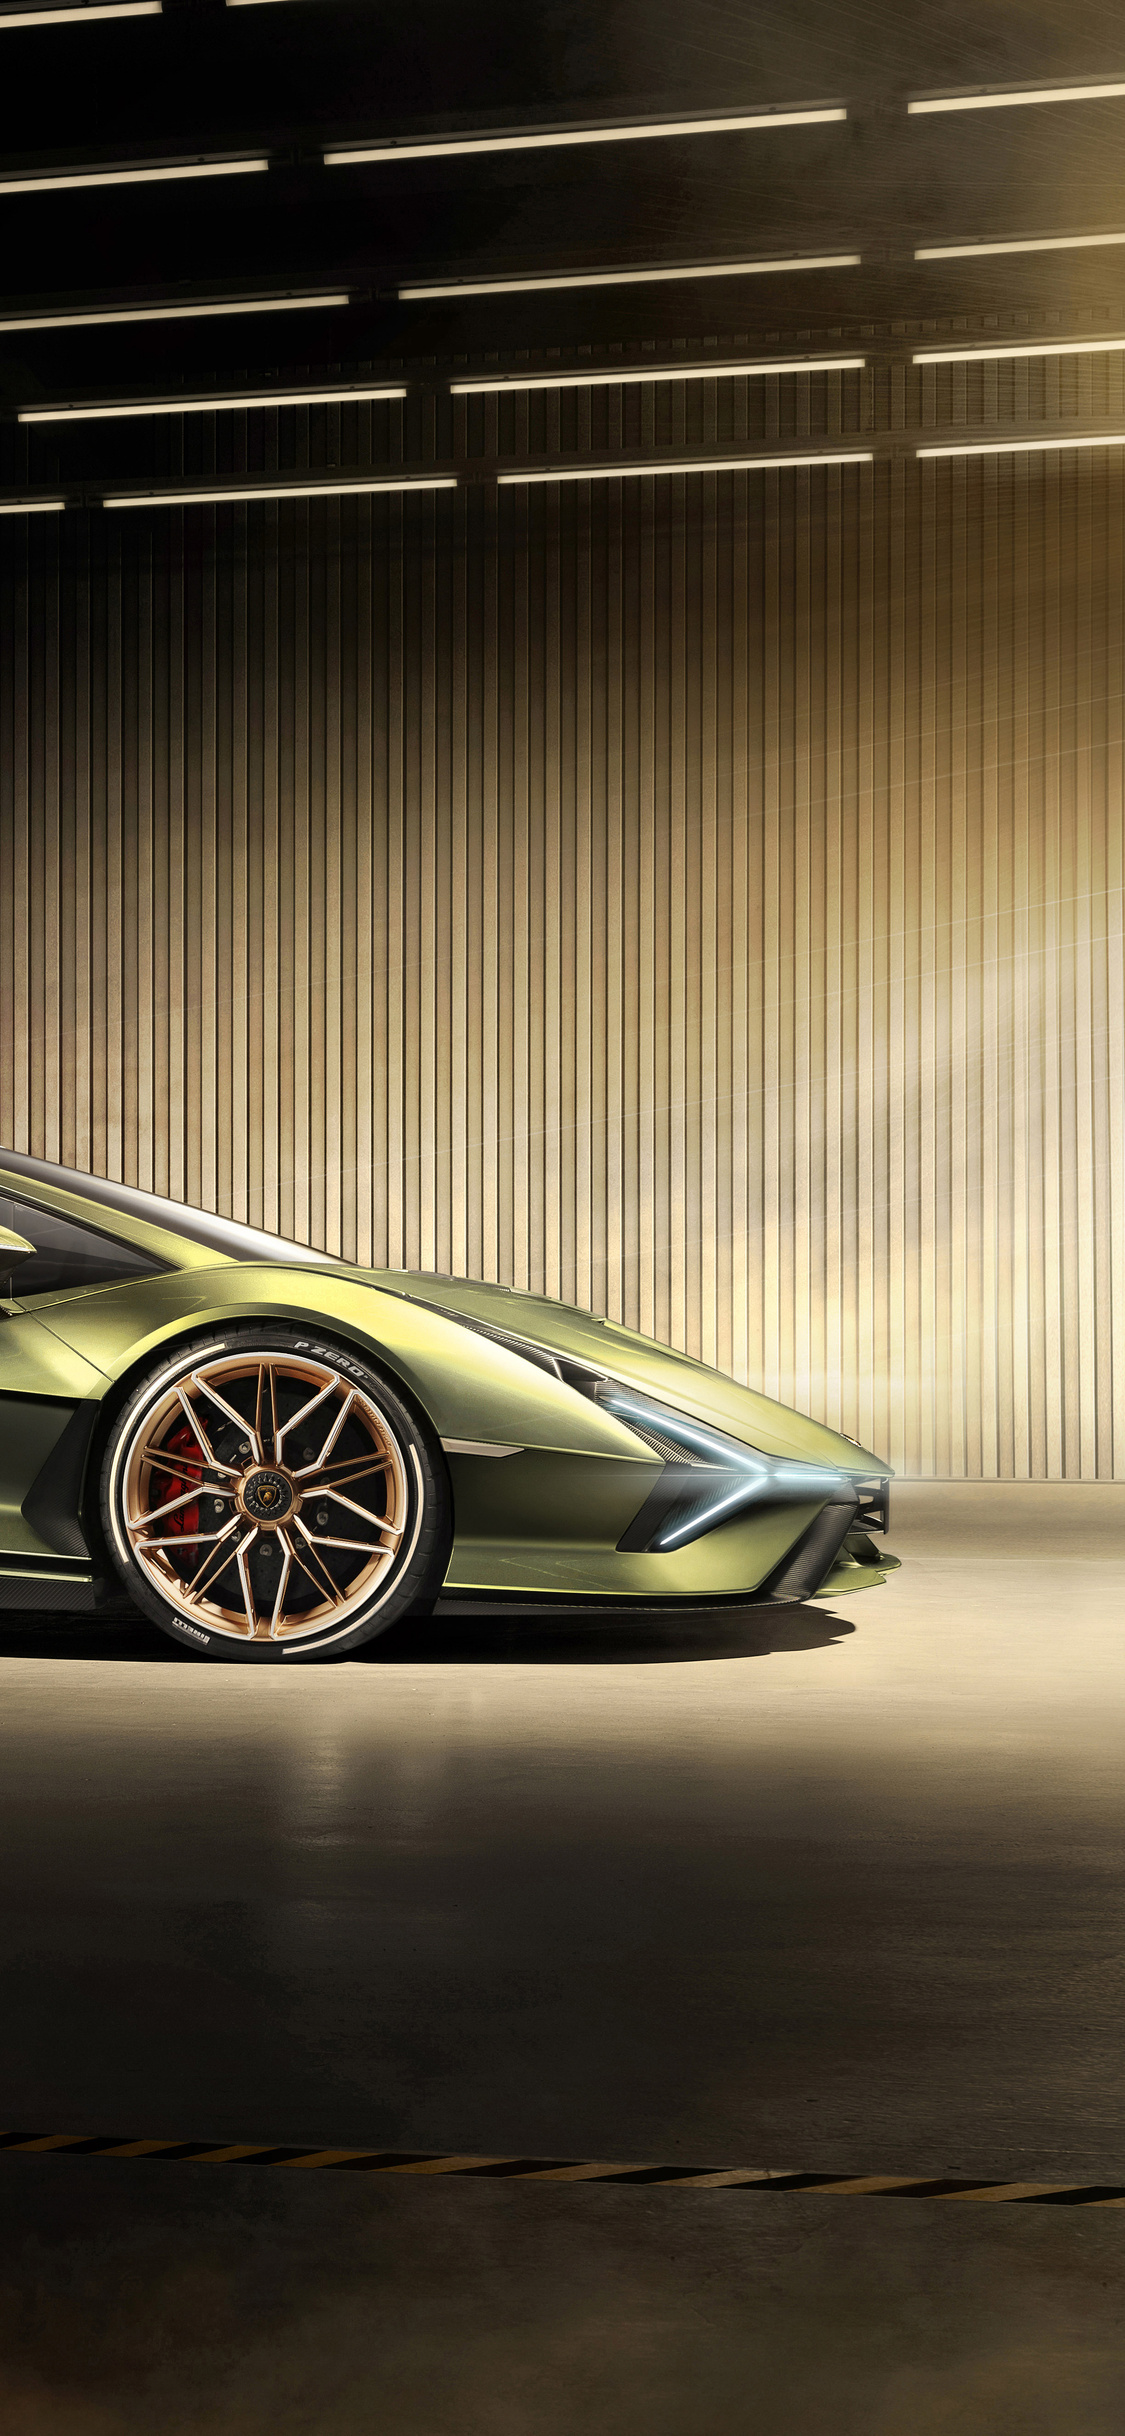 1125x2436 2019 Lamborghini Sian Side View Iphone XS,Iphone